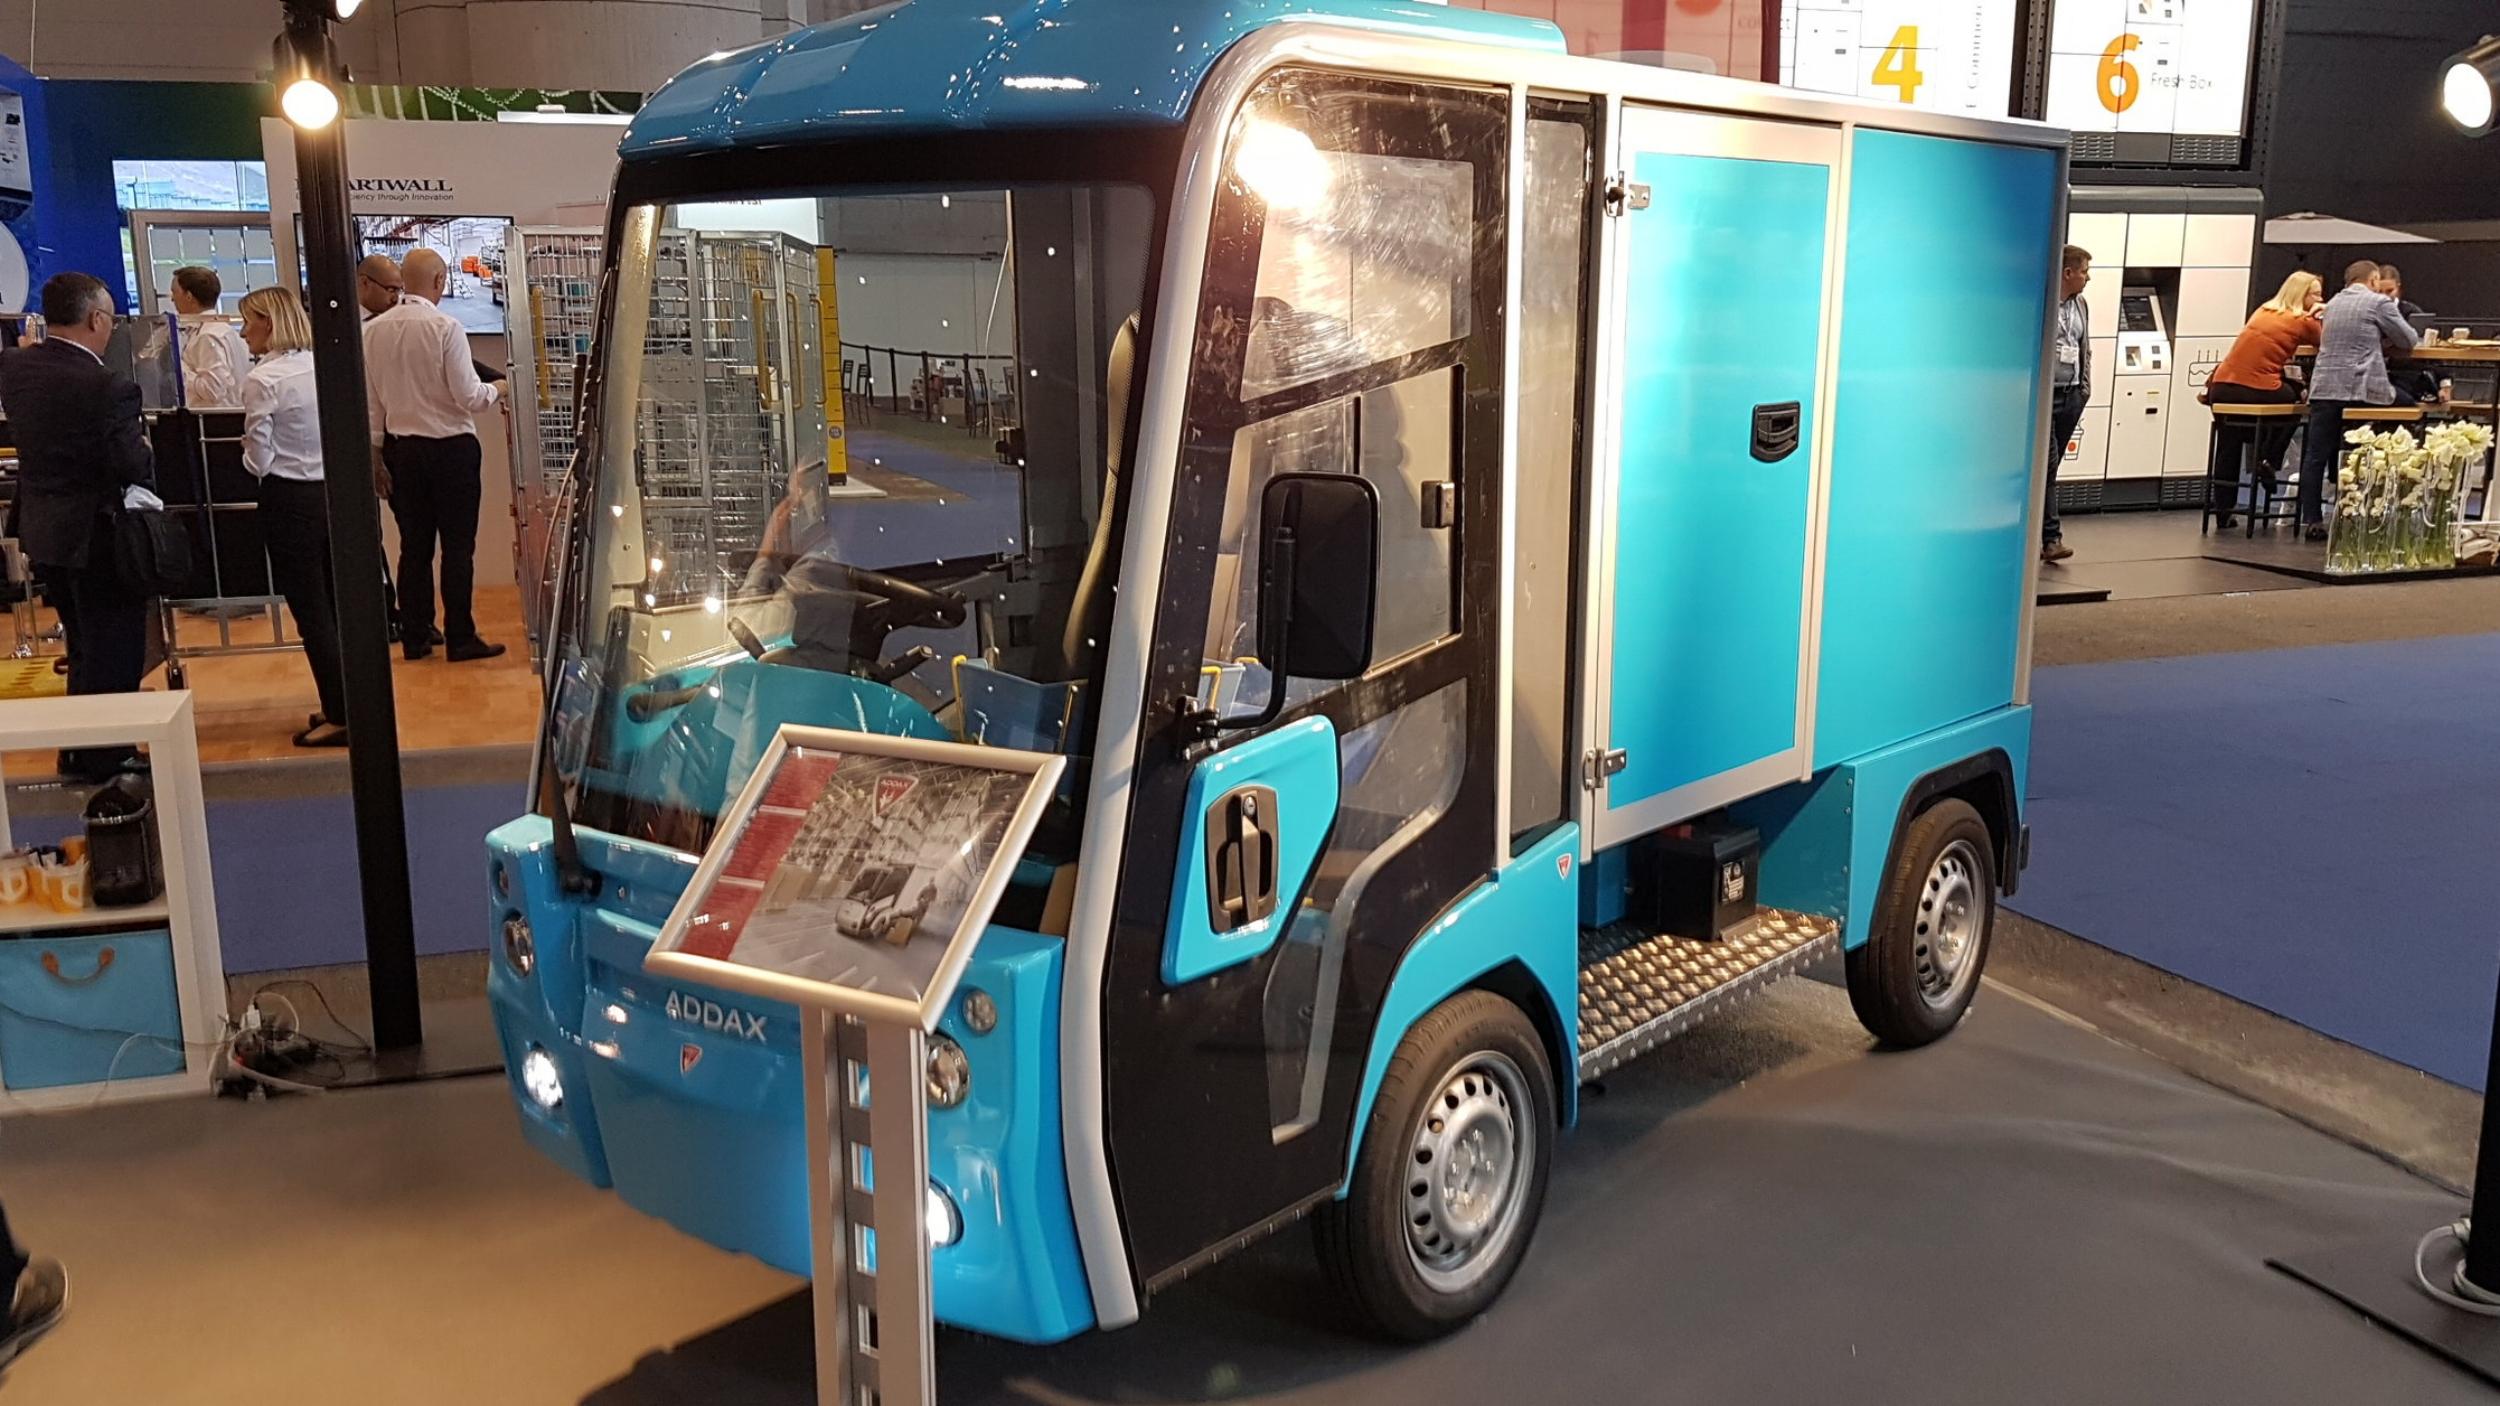 Addax electric van